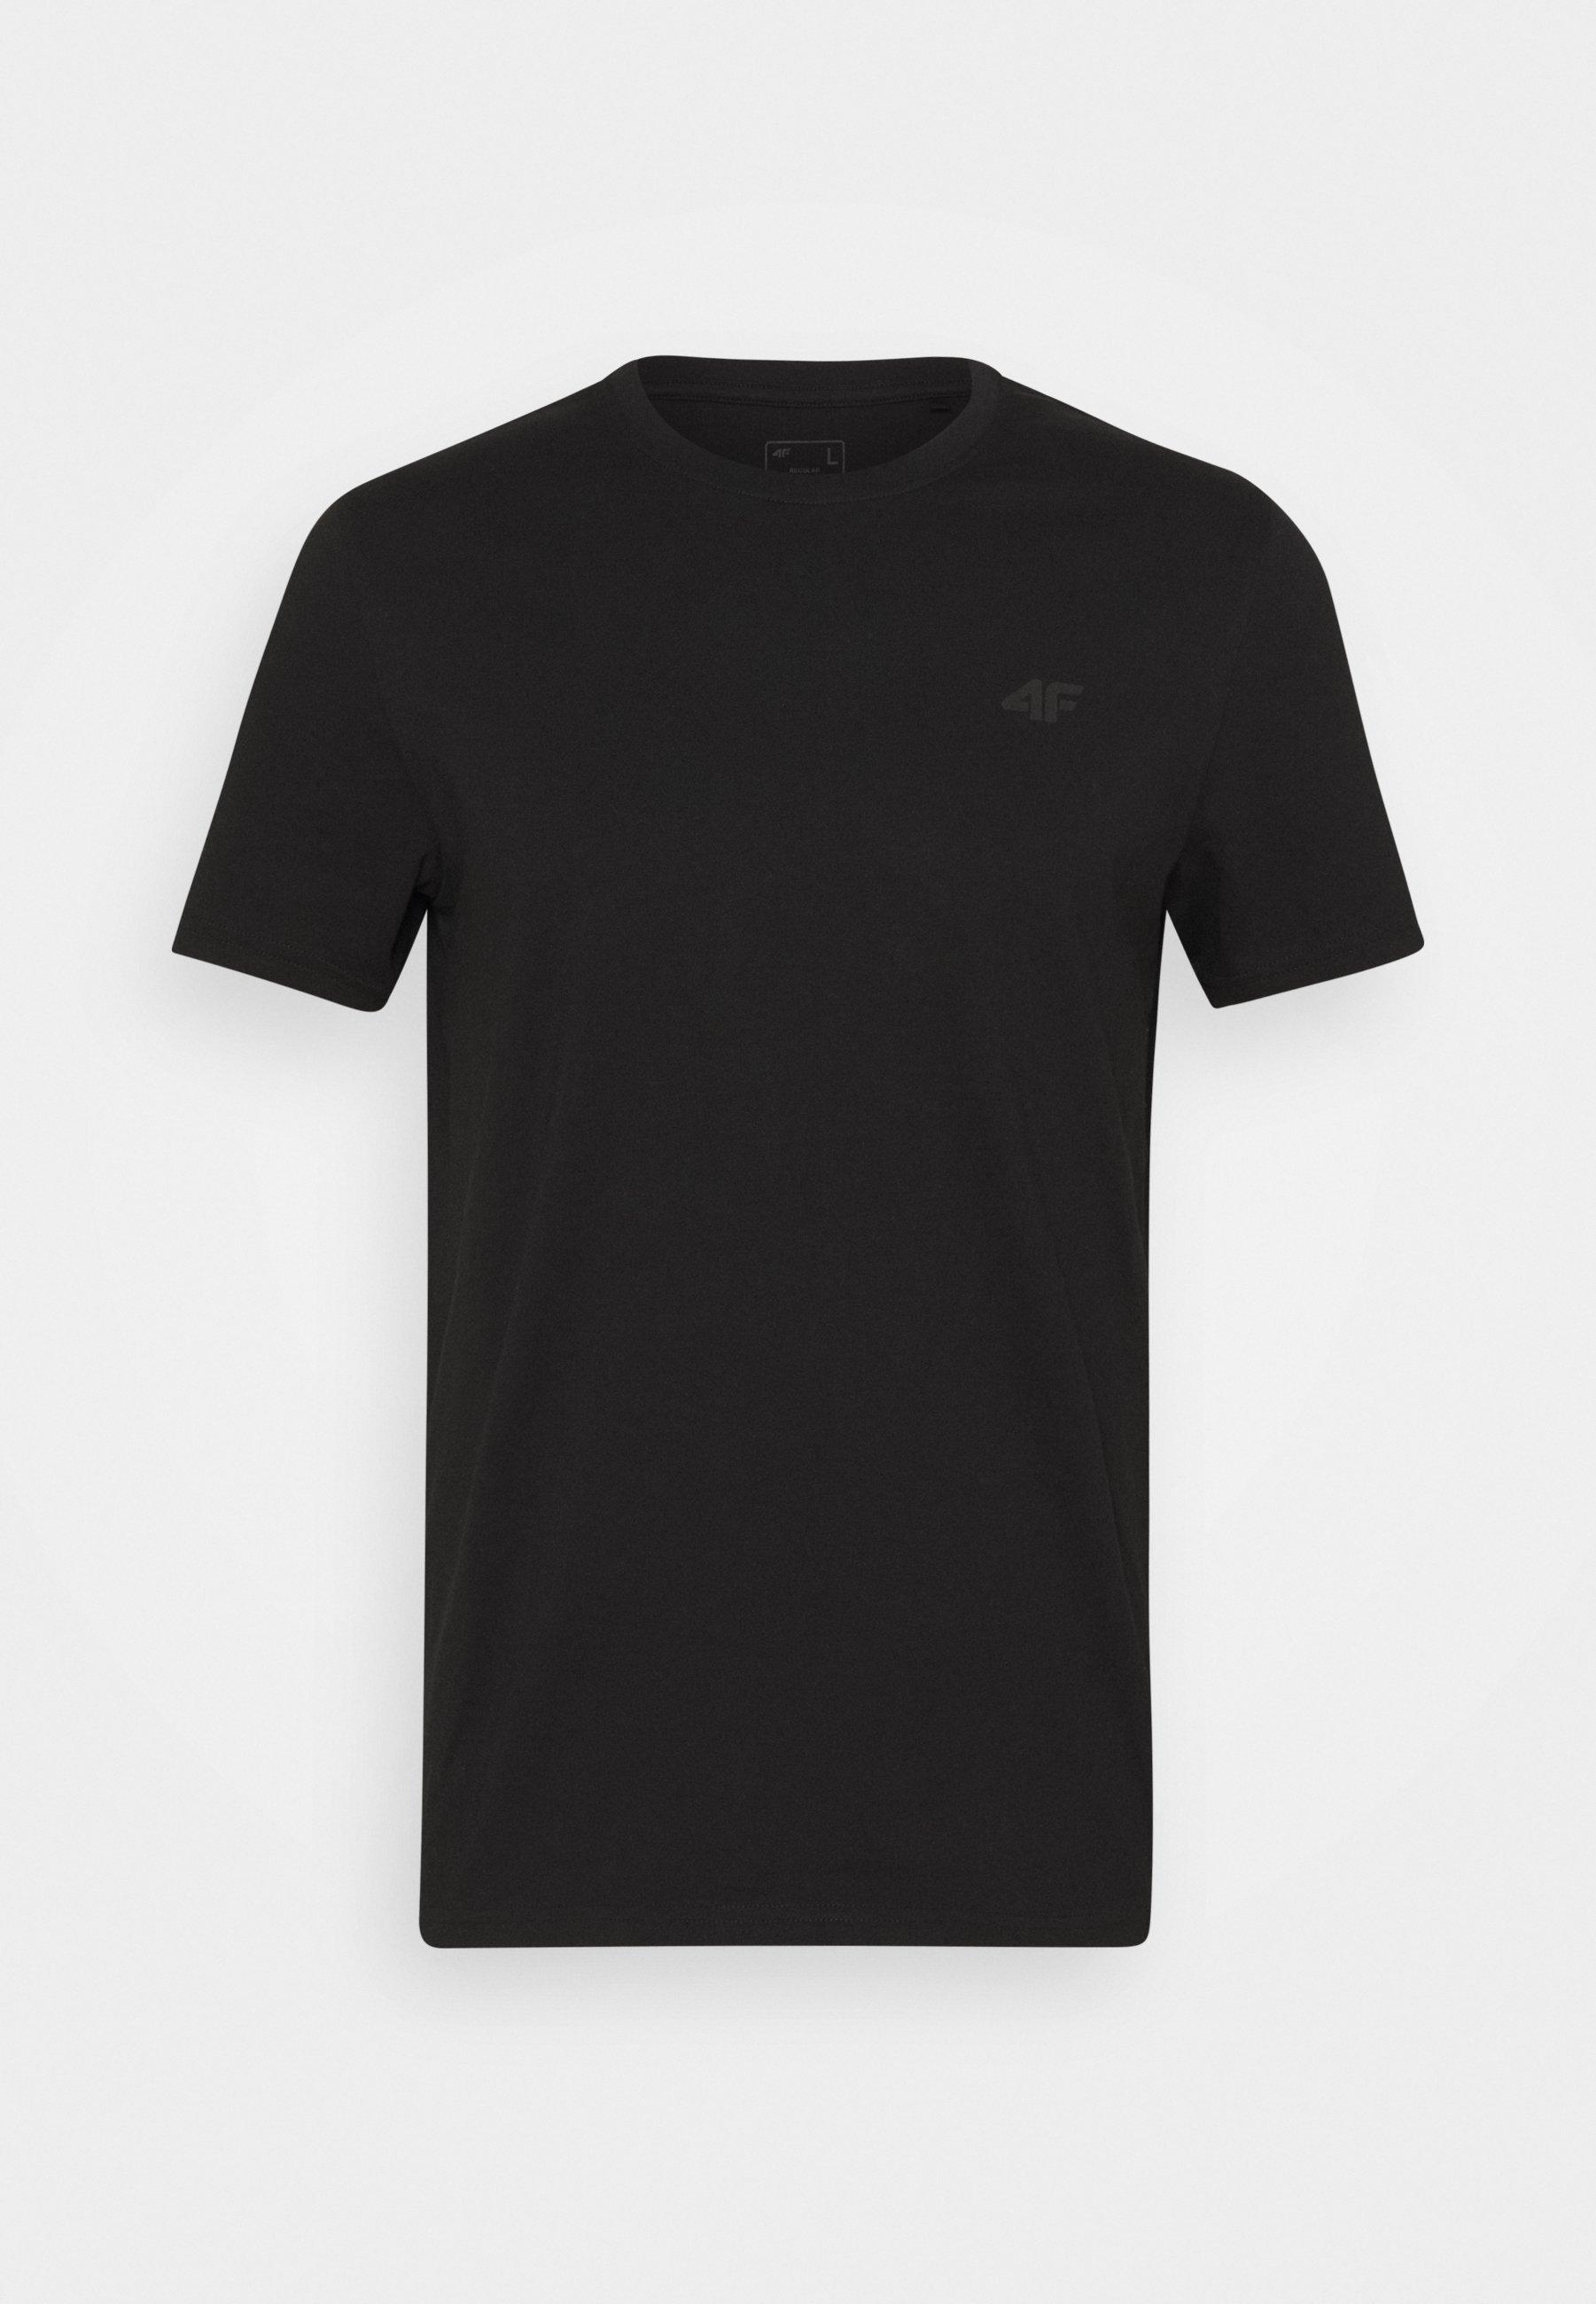 Men Men's T-shirt - Basic T-shirt